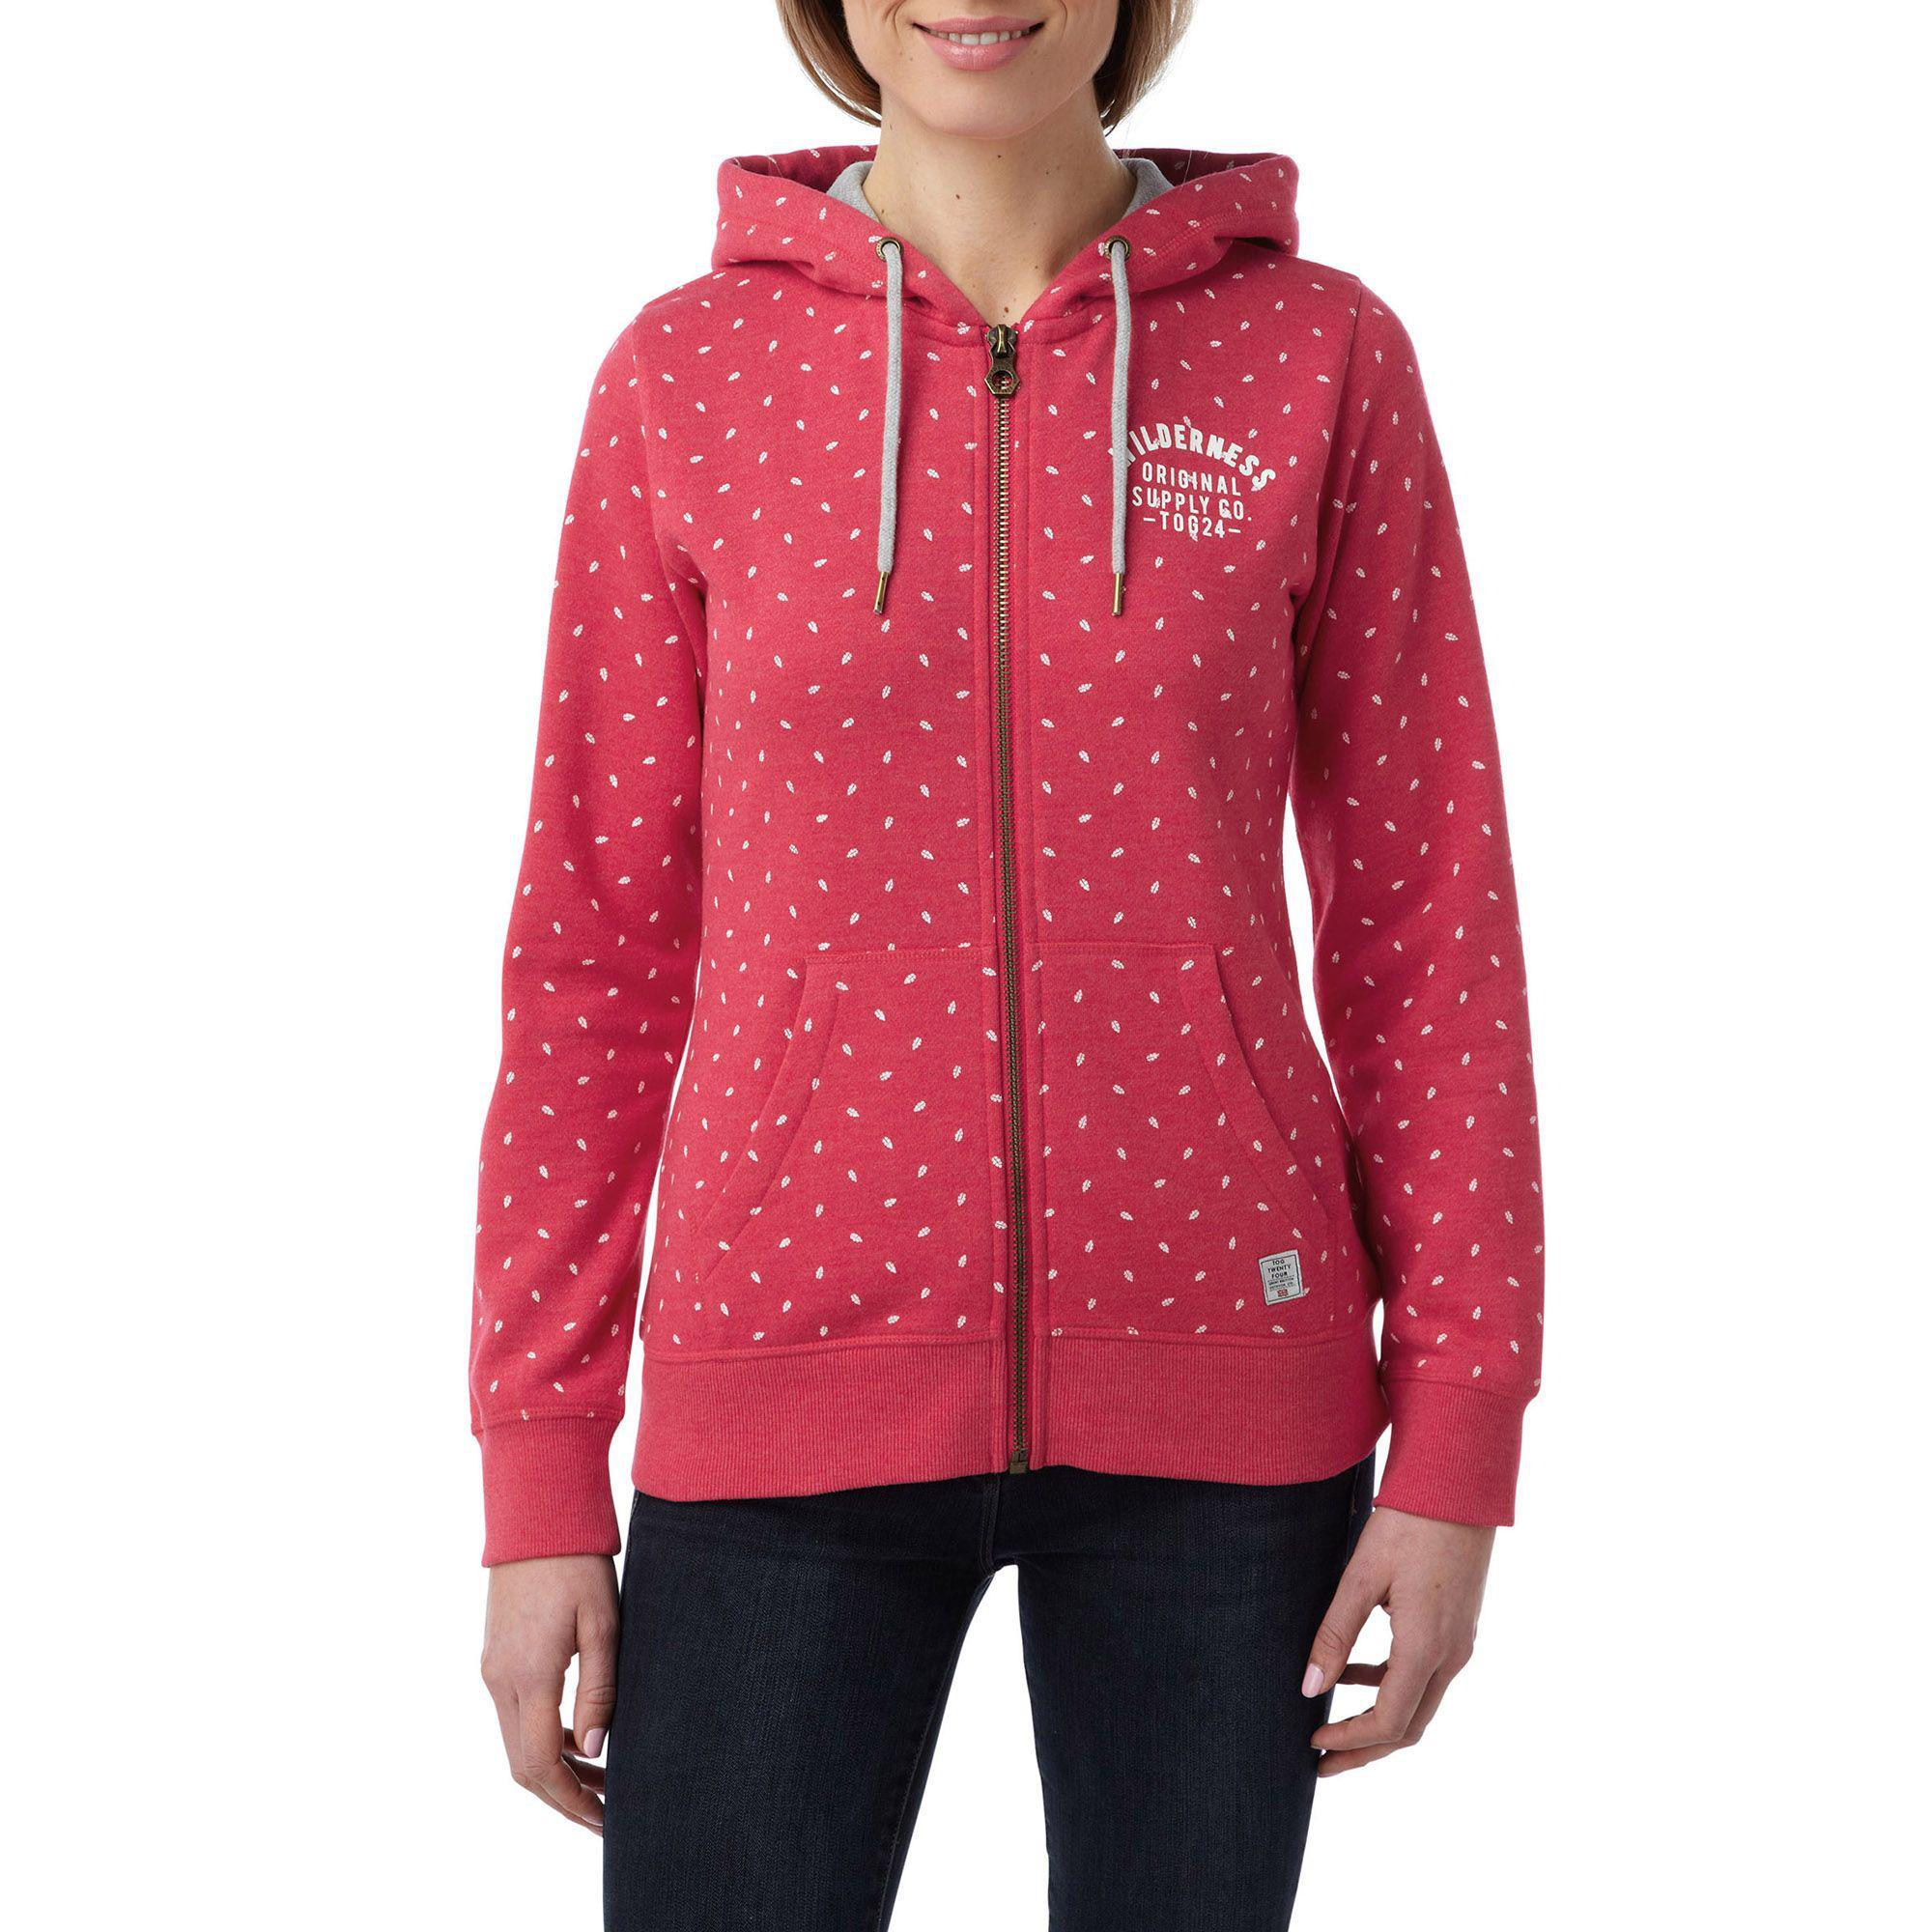 fe3910093 Tog 24 Rose Marl Ava Deluxe Zip Hoodie Wilderness in Pink - Lyst